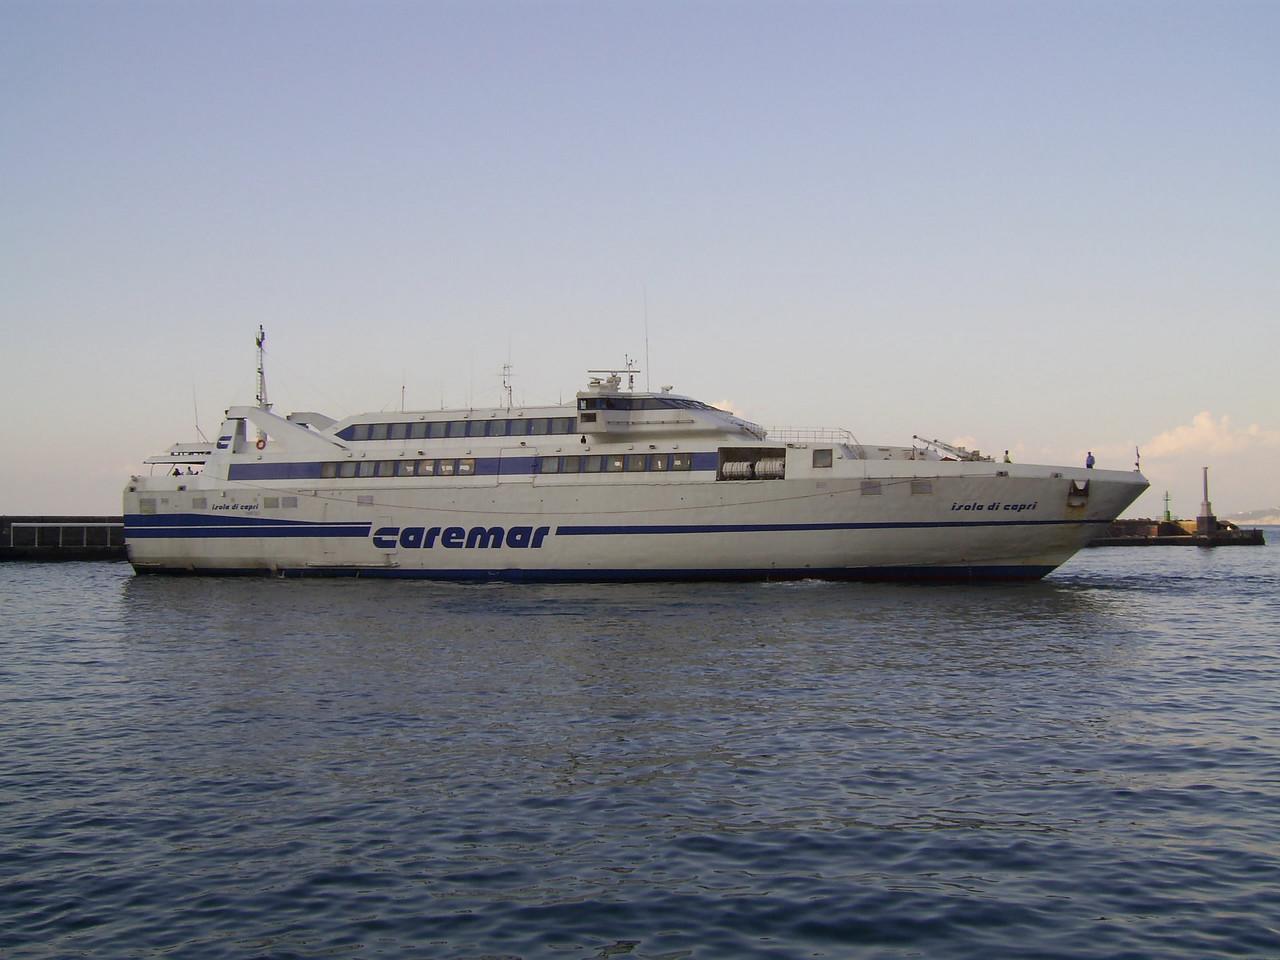 2007 - HSC ISOLA DI CAPRI arriving to Capri.